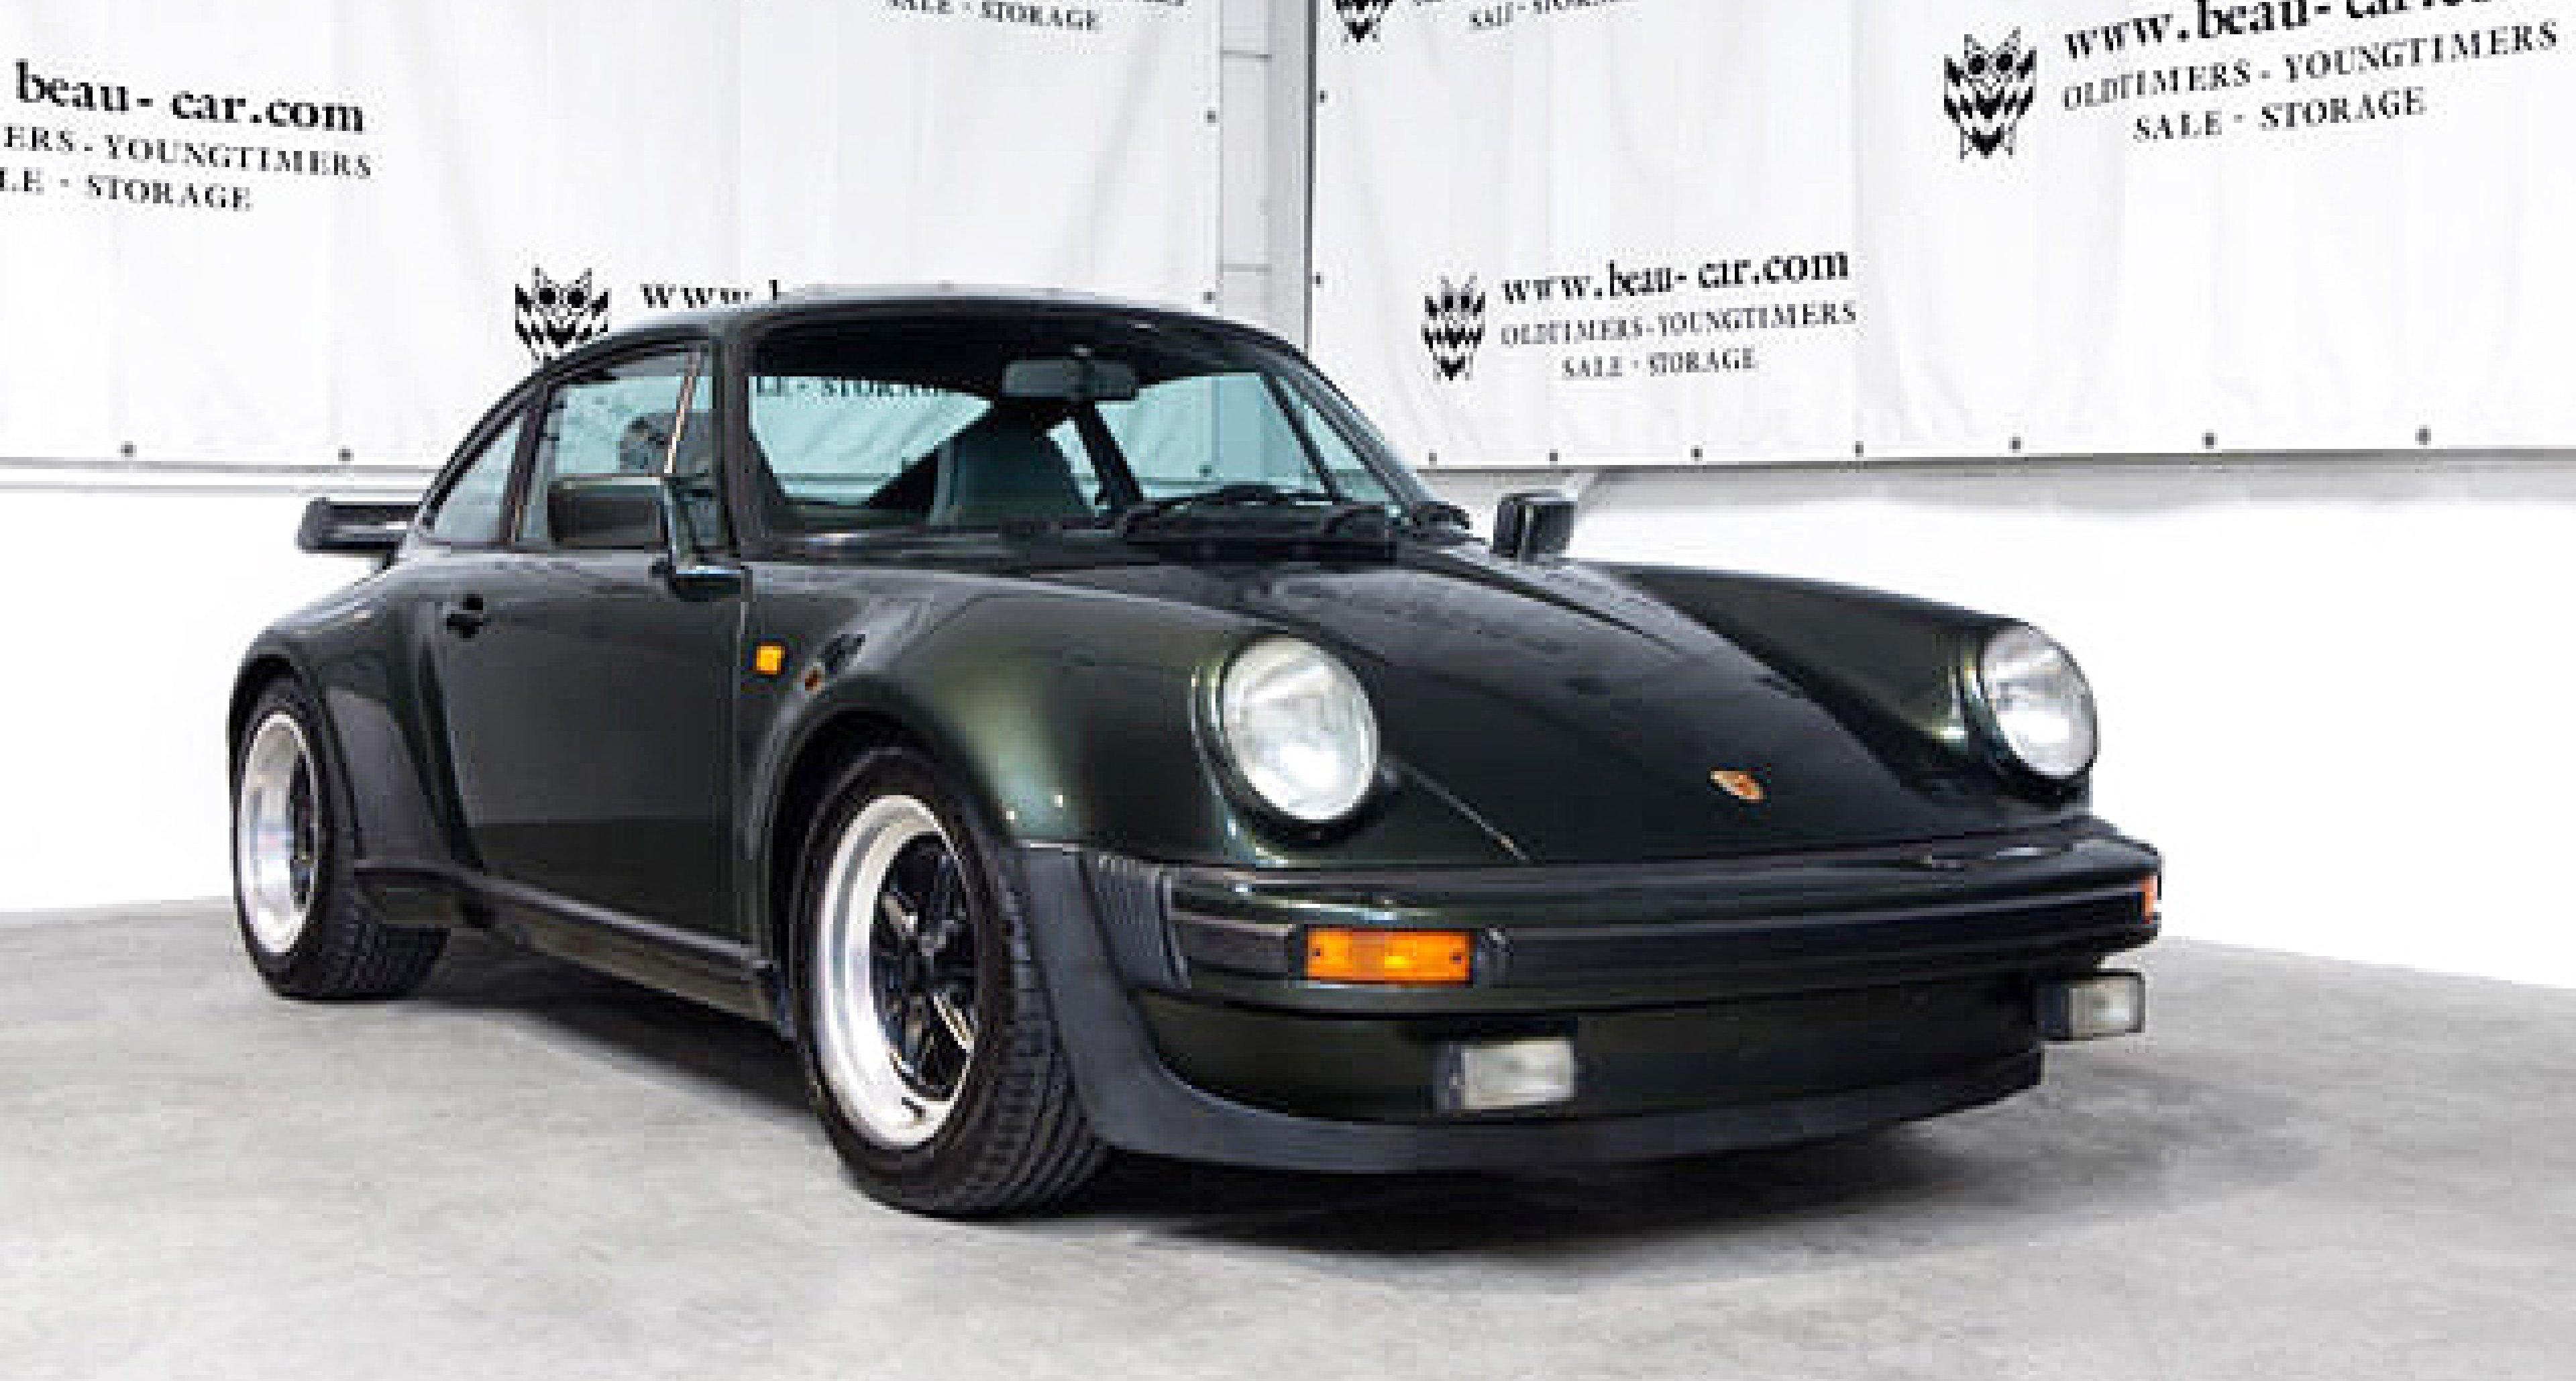 Porsche 911 Turbo Generations: The art of peer pressure